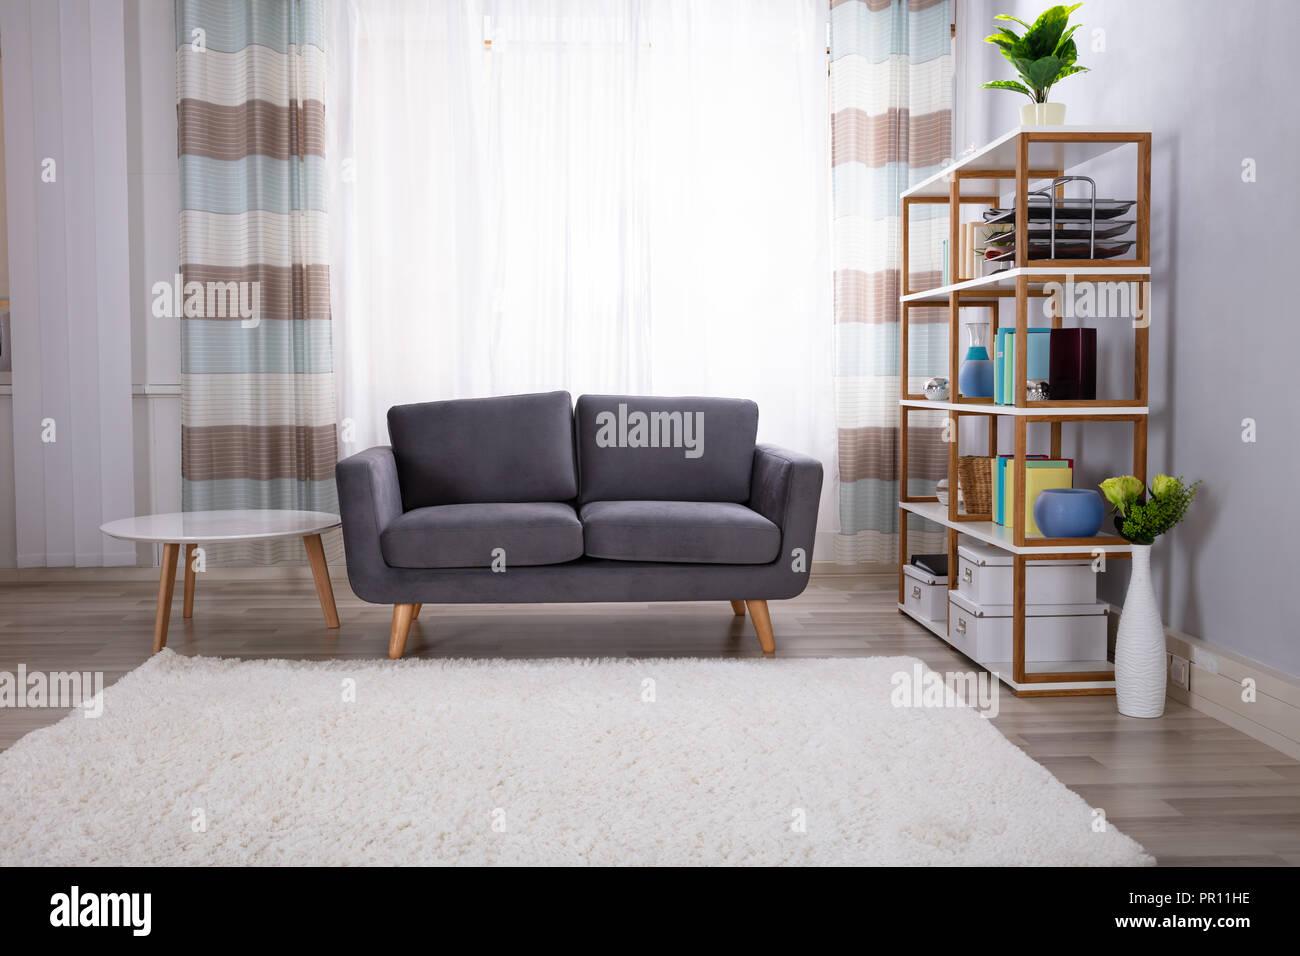 Interior Photo Of Beautiful Modern Living Room Stock Photo ...